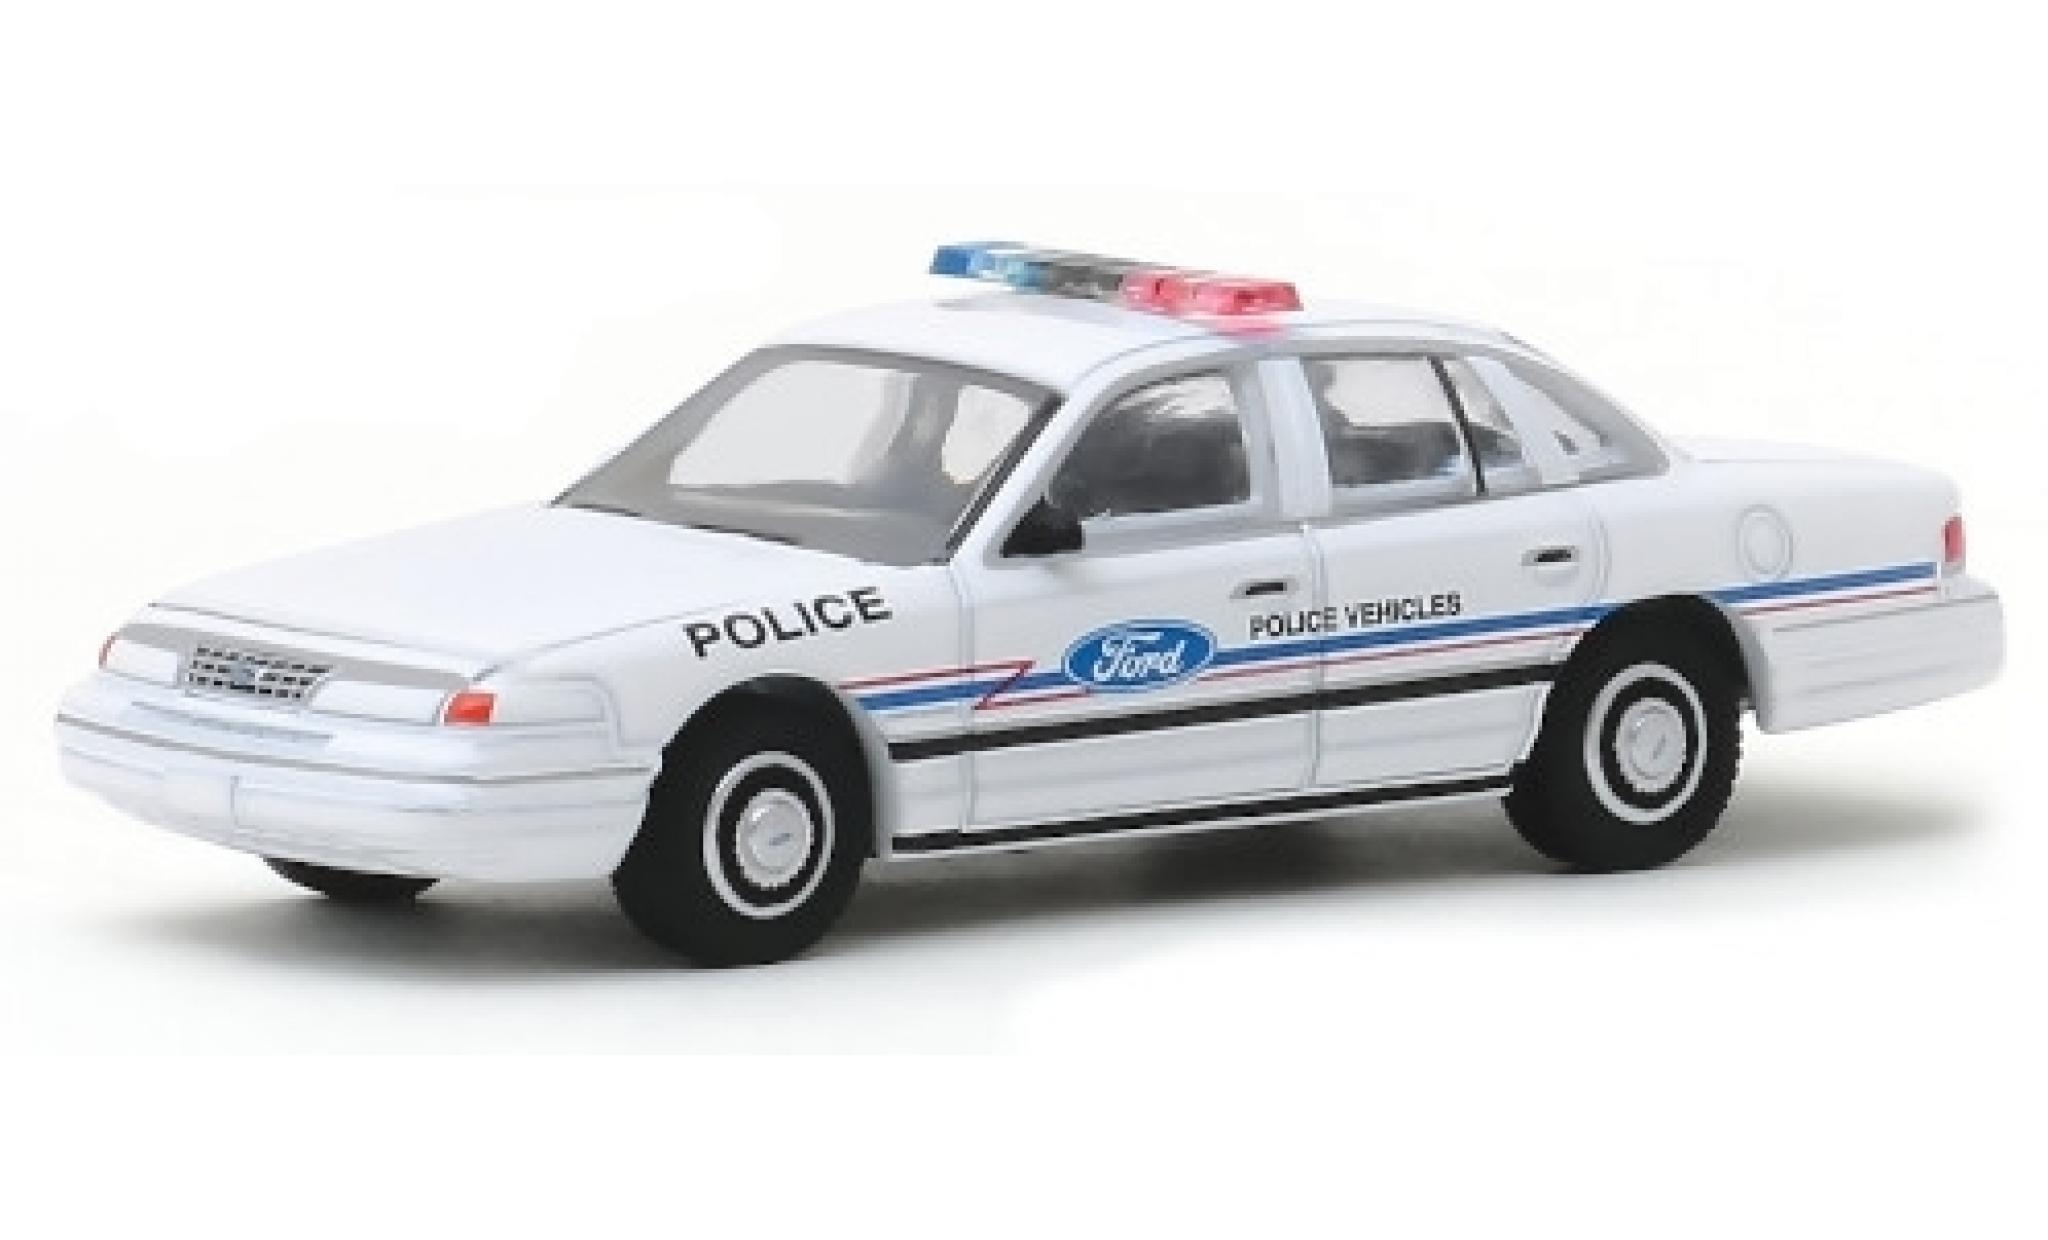 Ford Crown 1/64 Greenlight Victoria Police Interceptor Police Vehicles 1993 Showfahrzeug